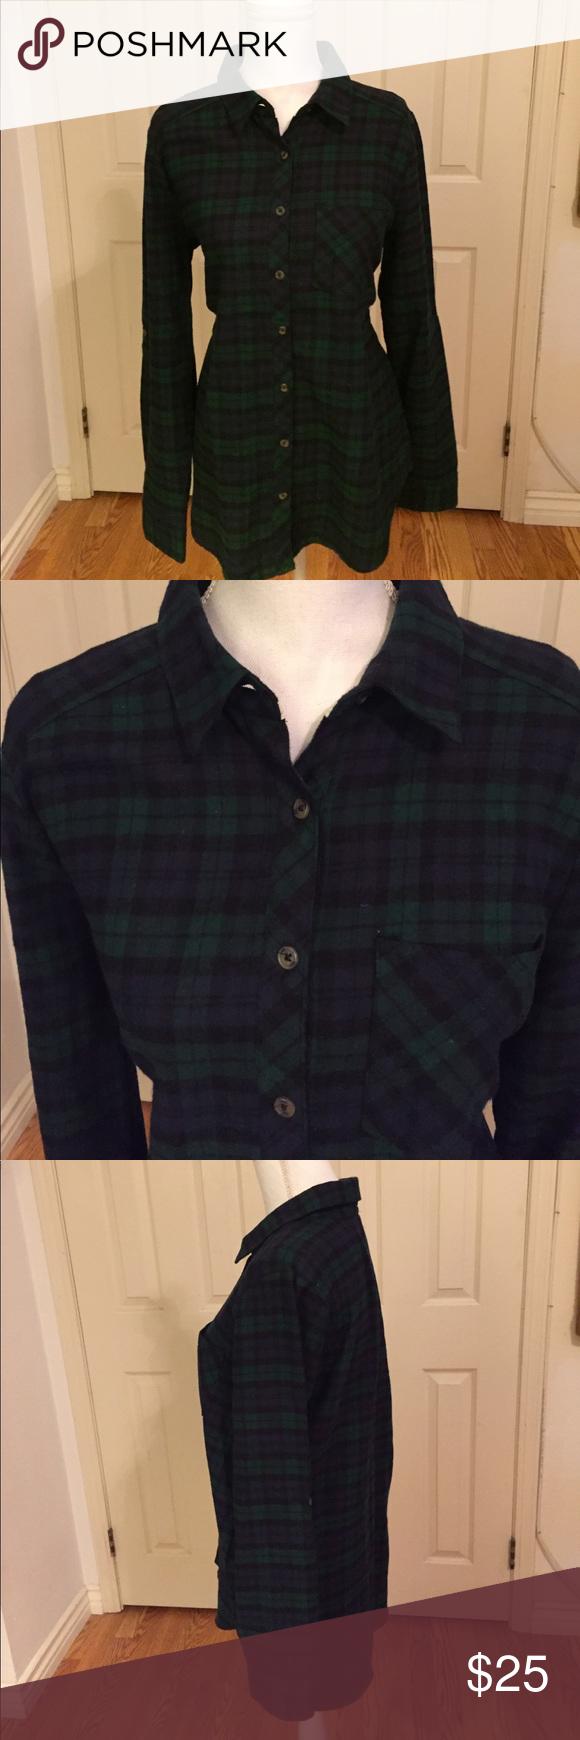 Dark green dress shirt  Drk GreenNavy Plaid Flannel Shirt w Long Sleeves  Plaid flannel